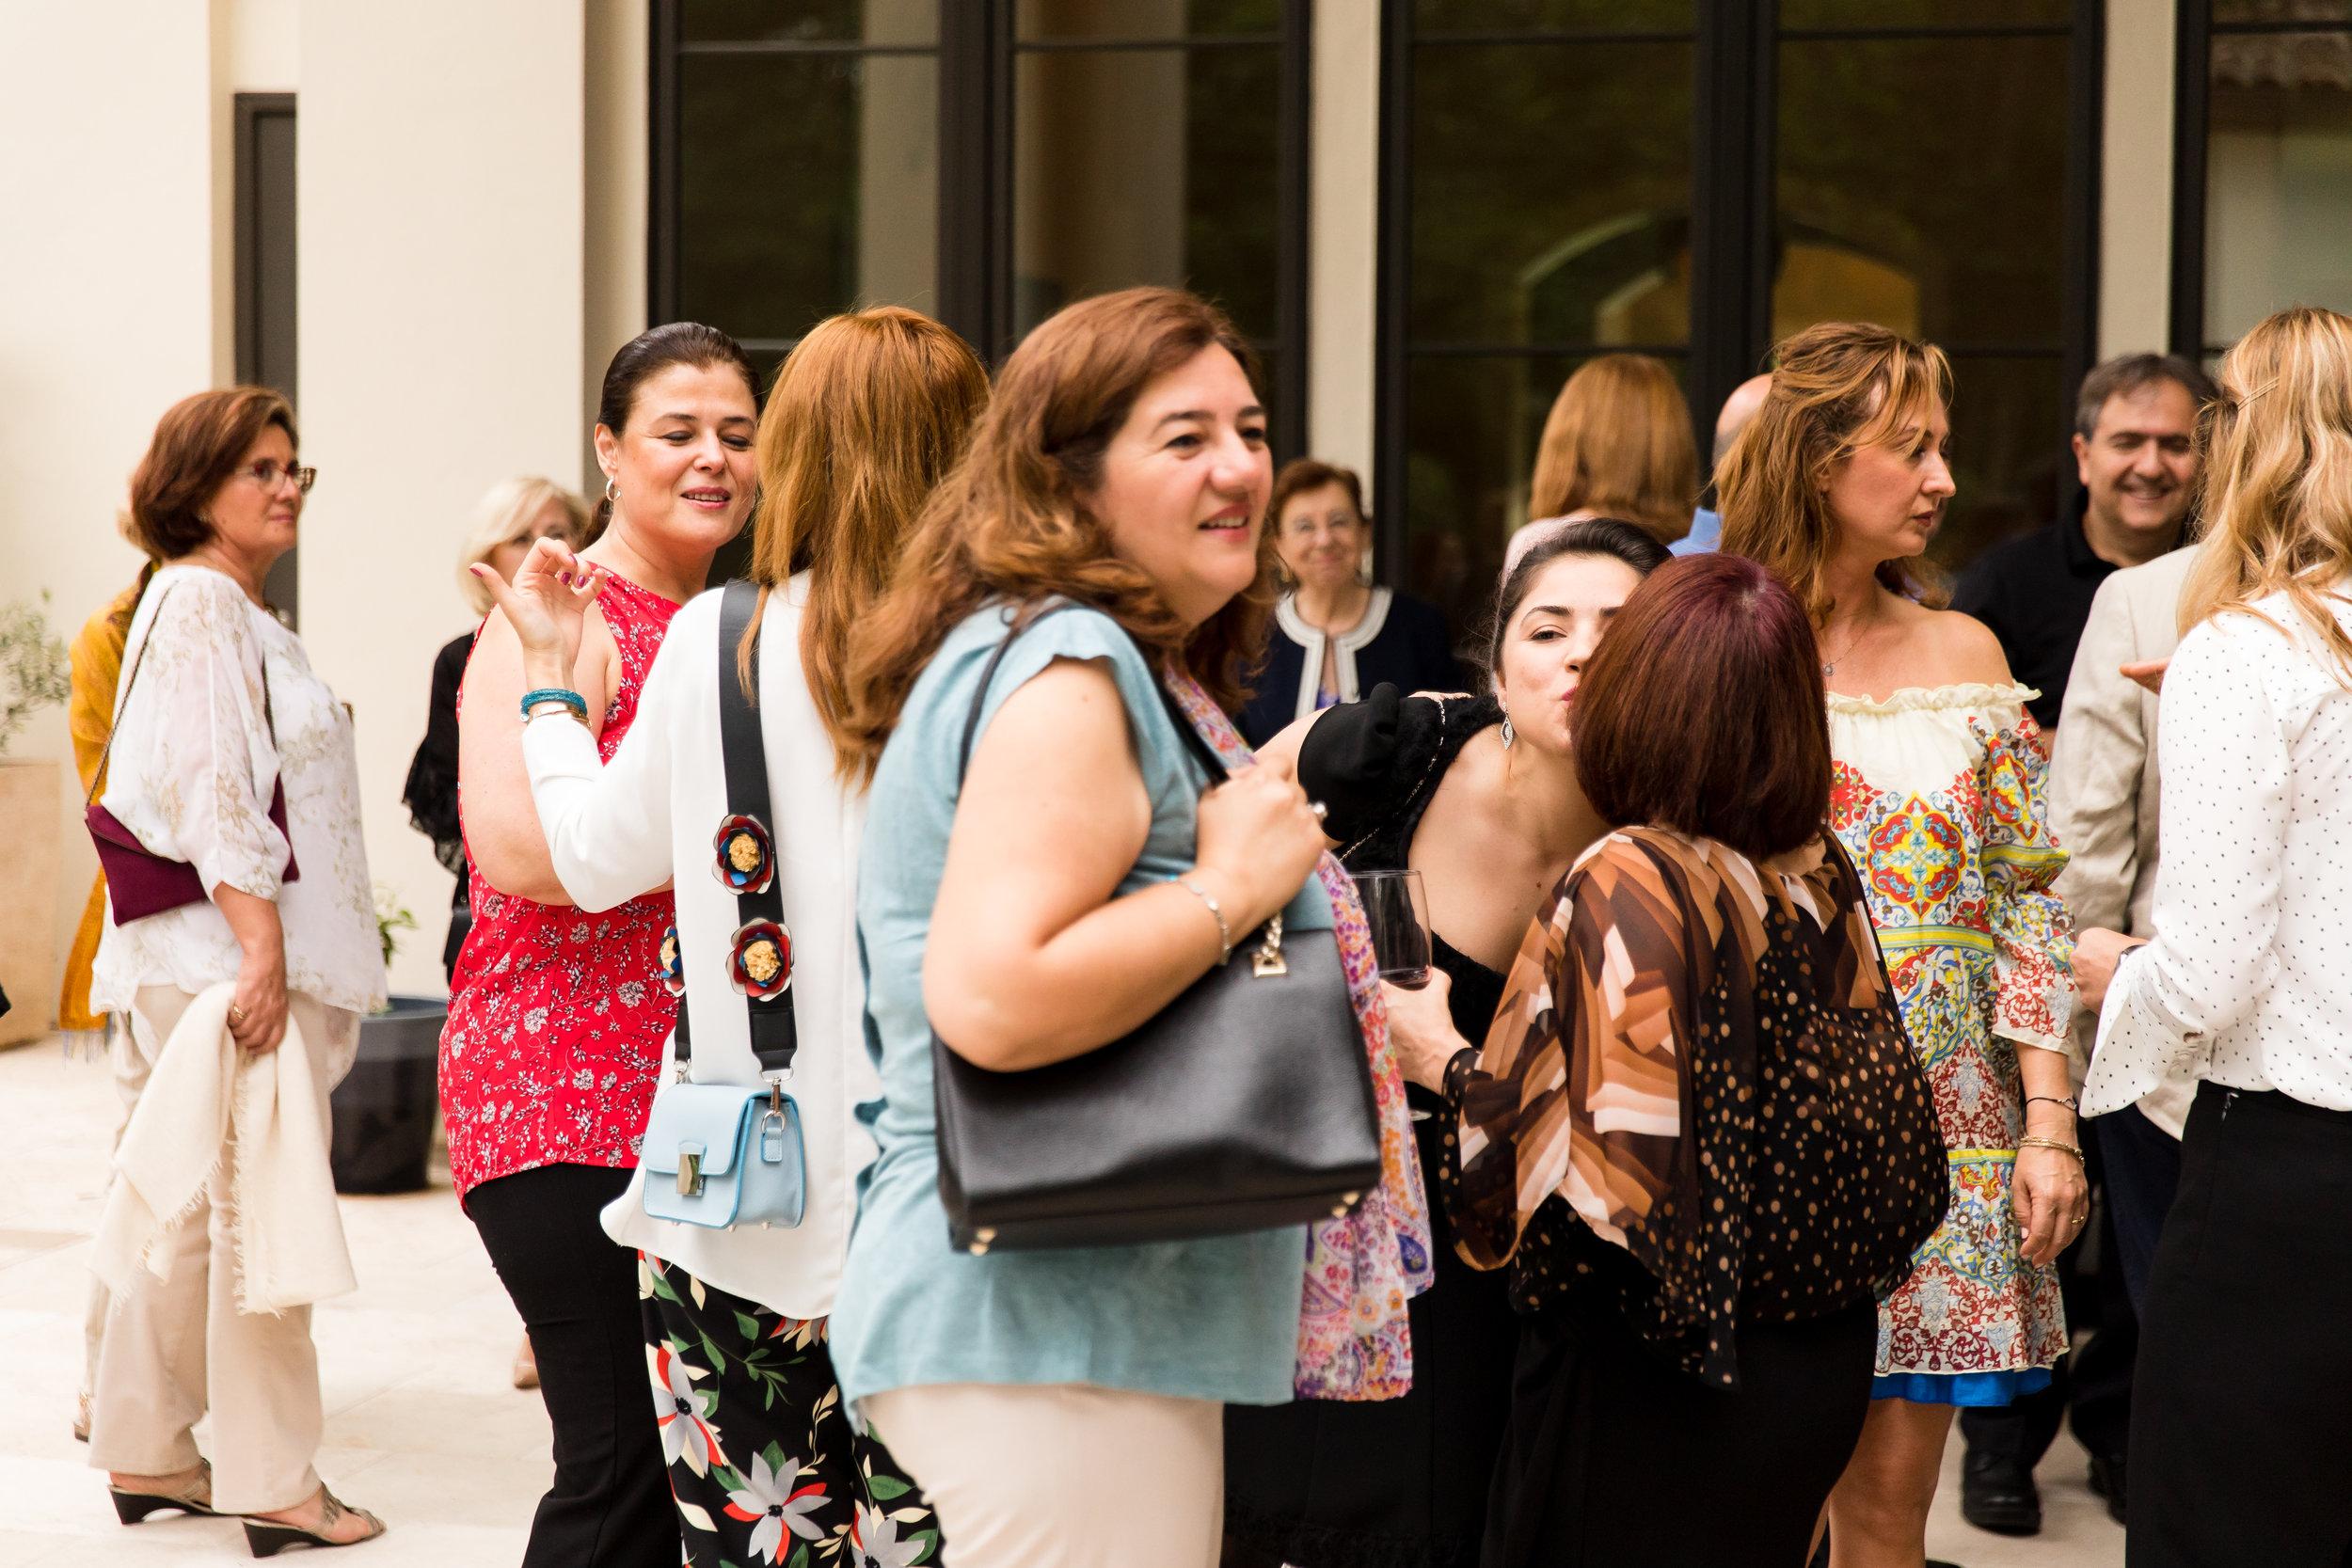 20180421-3rd Annual Education Women Turkey-187.jpg